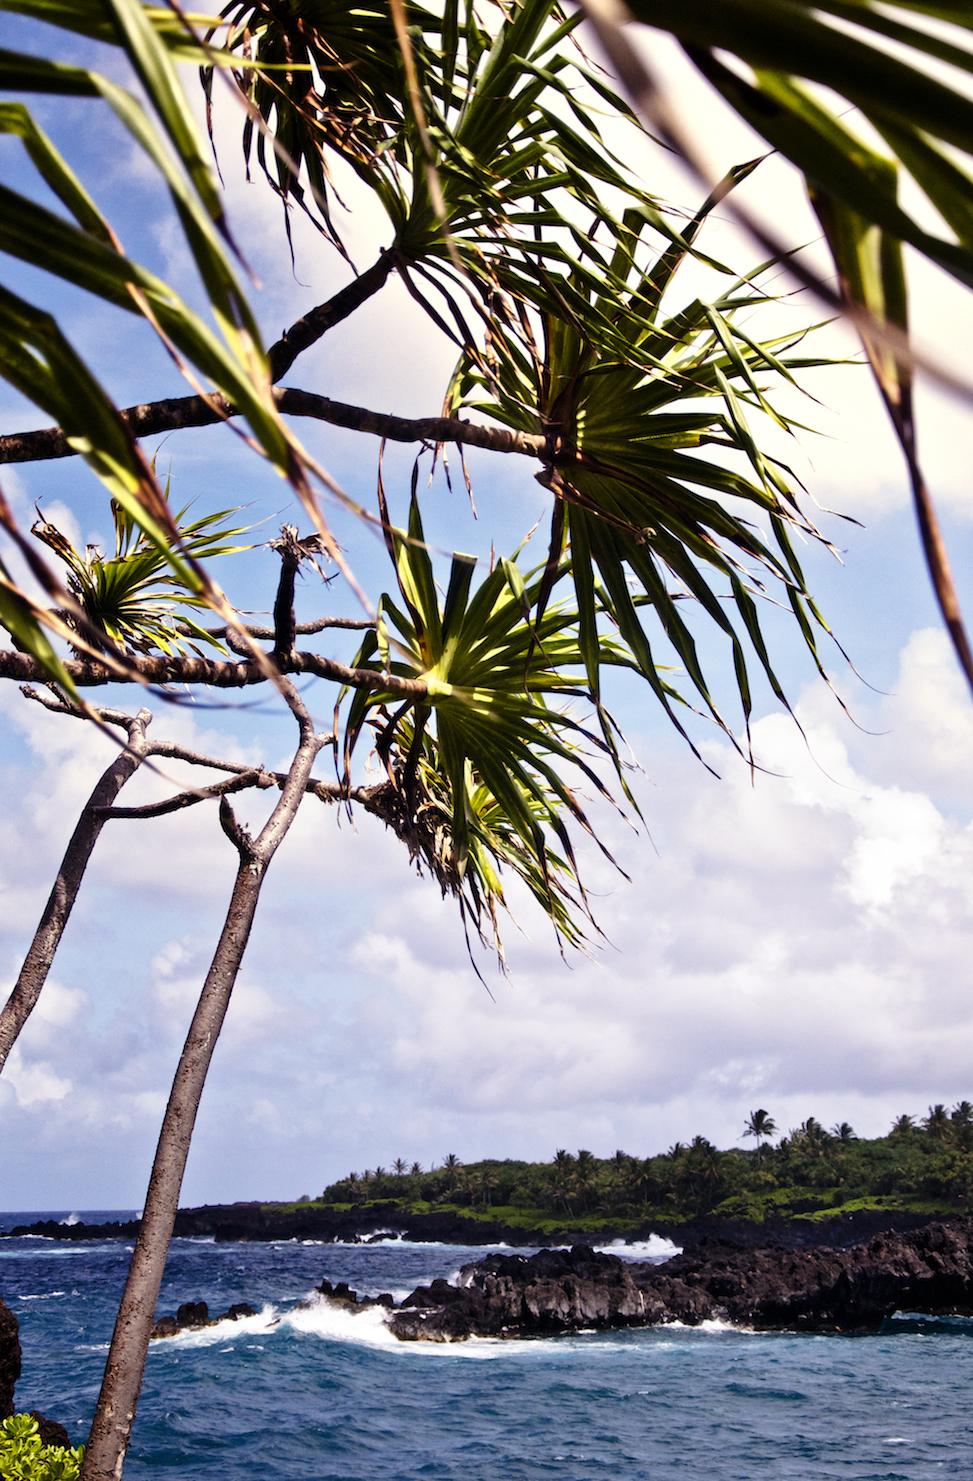 Wainapanapa State Beach, maui, hawaii